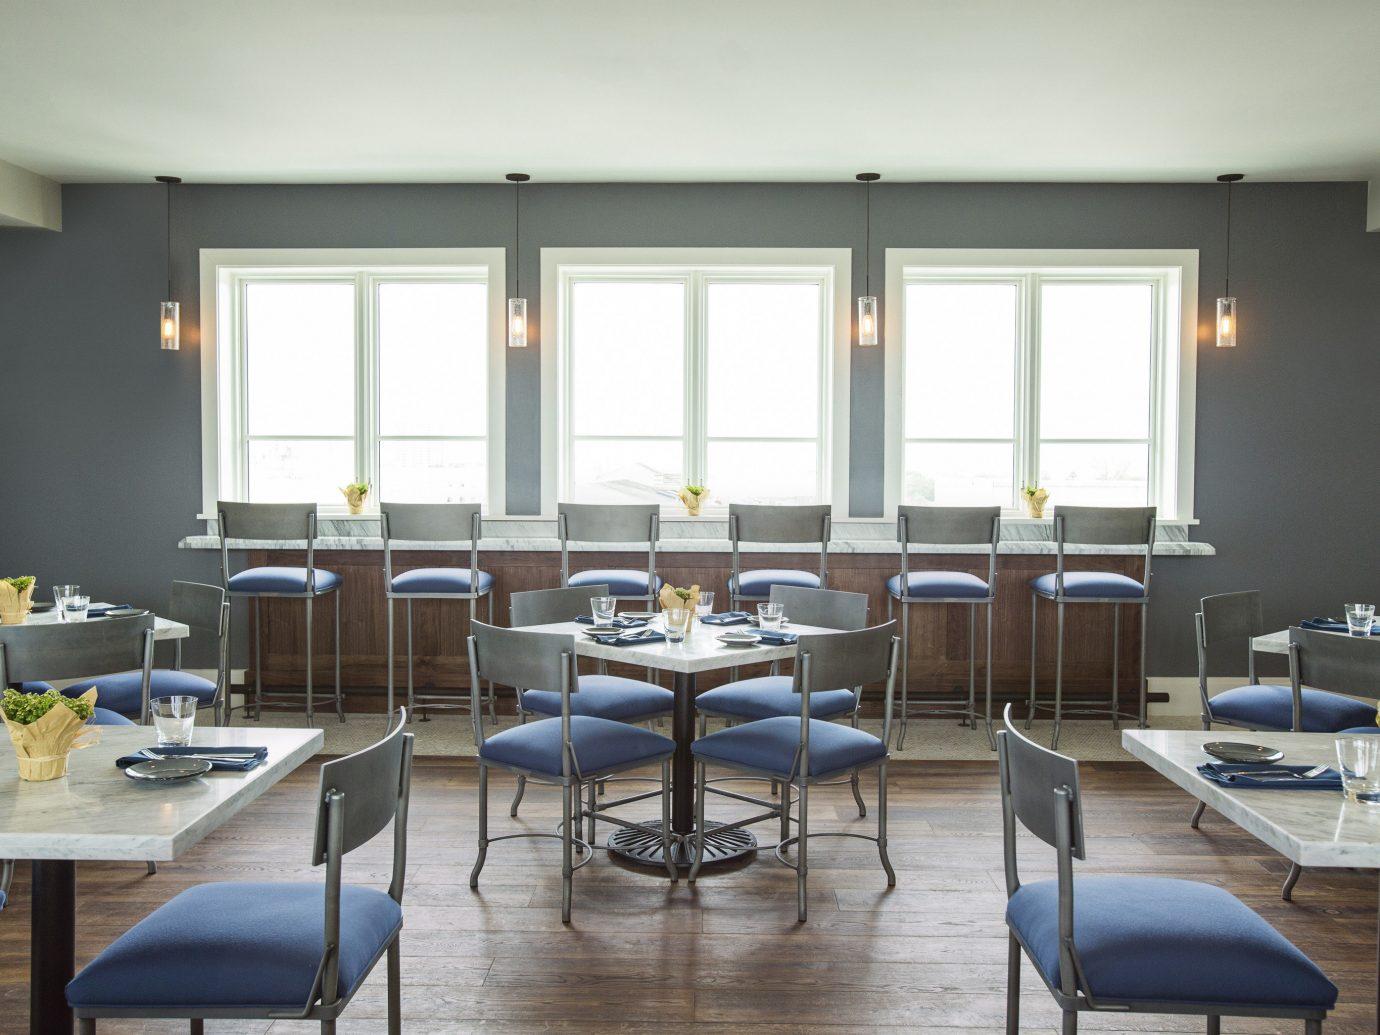 Hotels floor table indoor chair window ceiling room interior design furniture restaurant classroom dining room area several